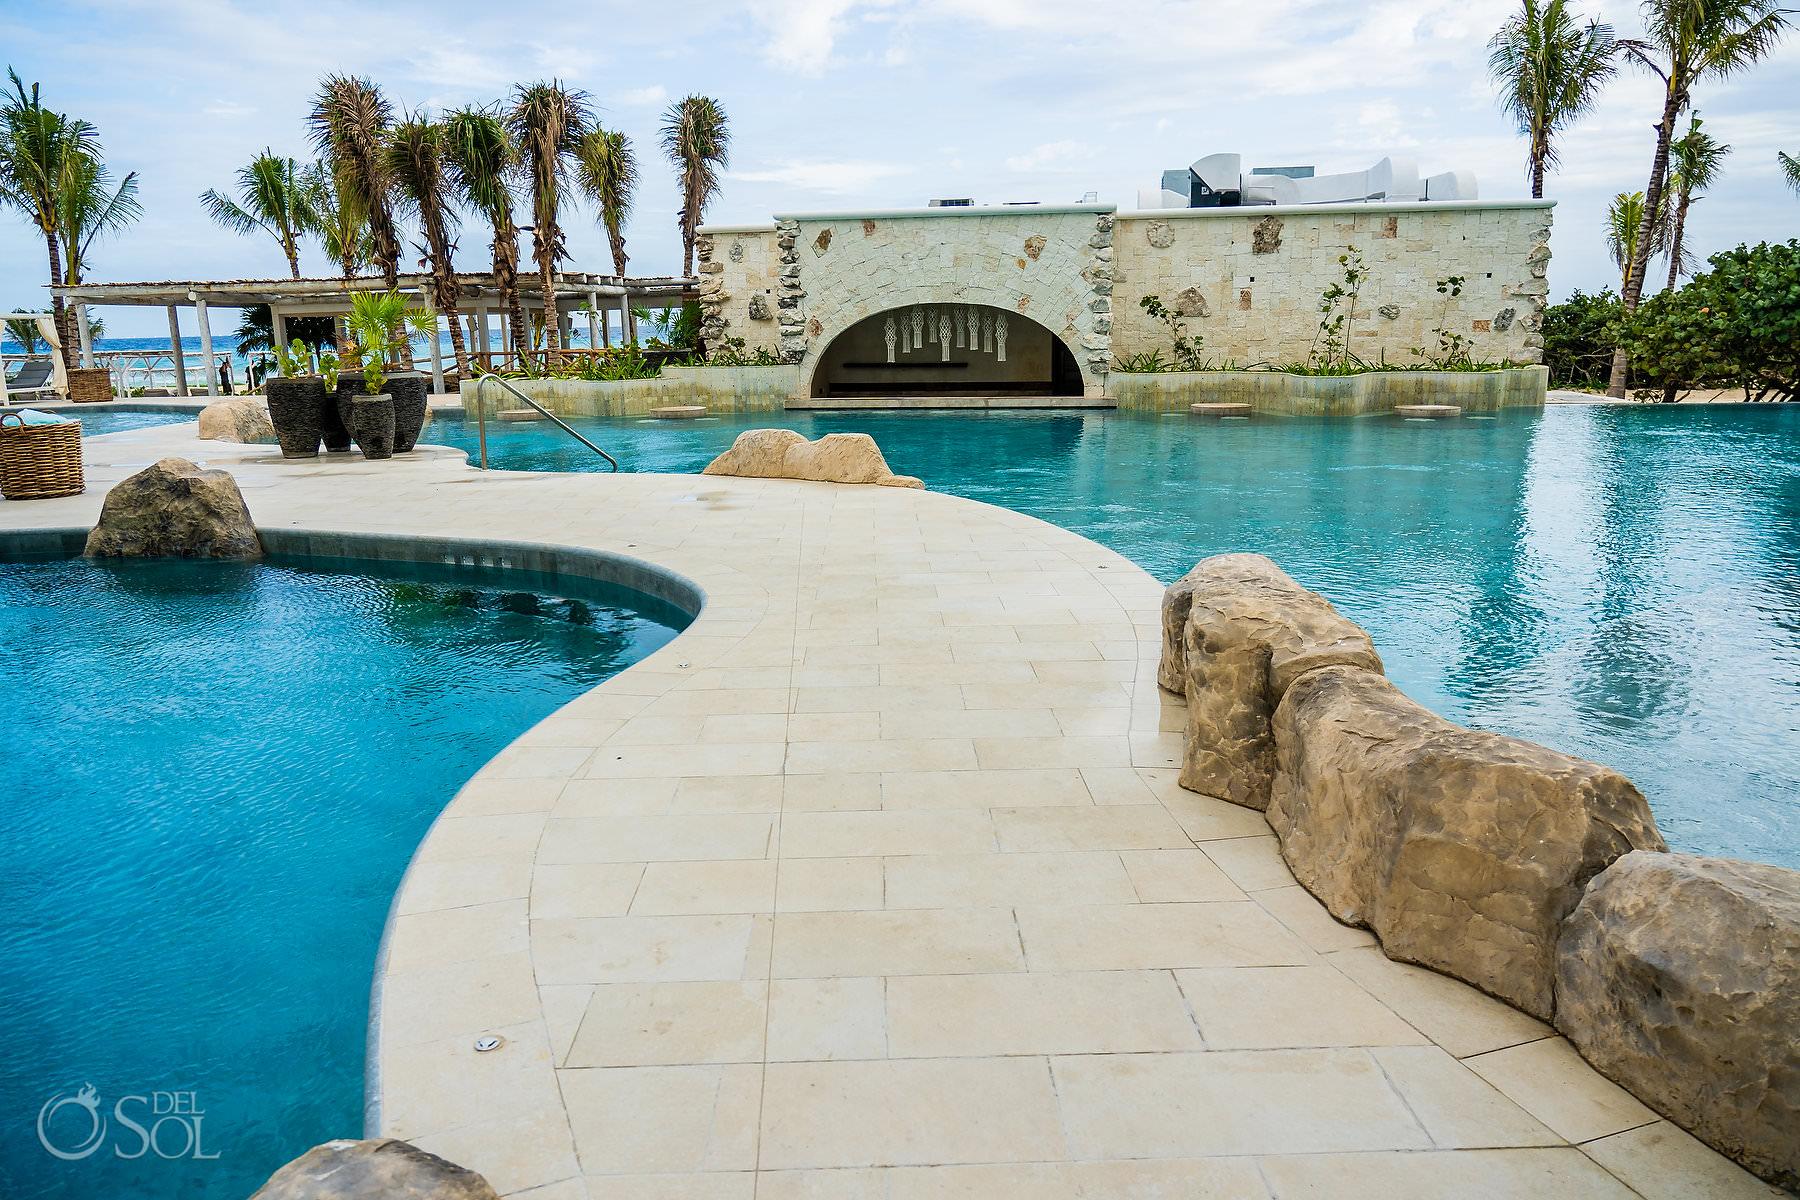 Palmaia House of Aia swim up bar Playa del Carmen